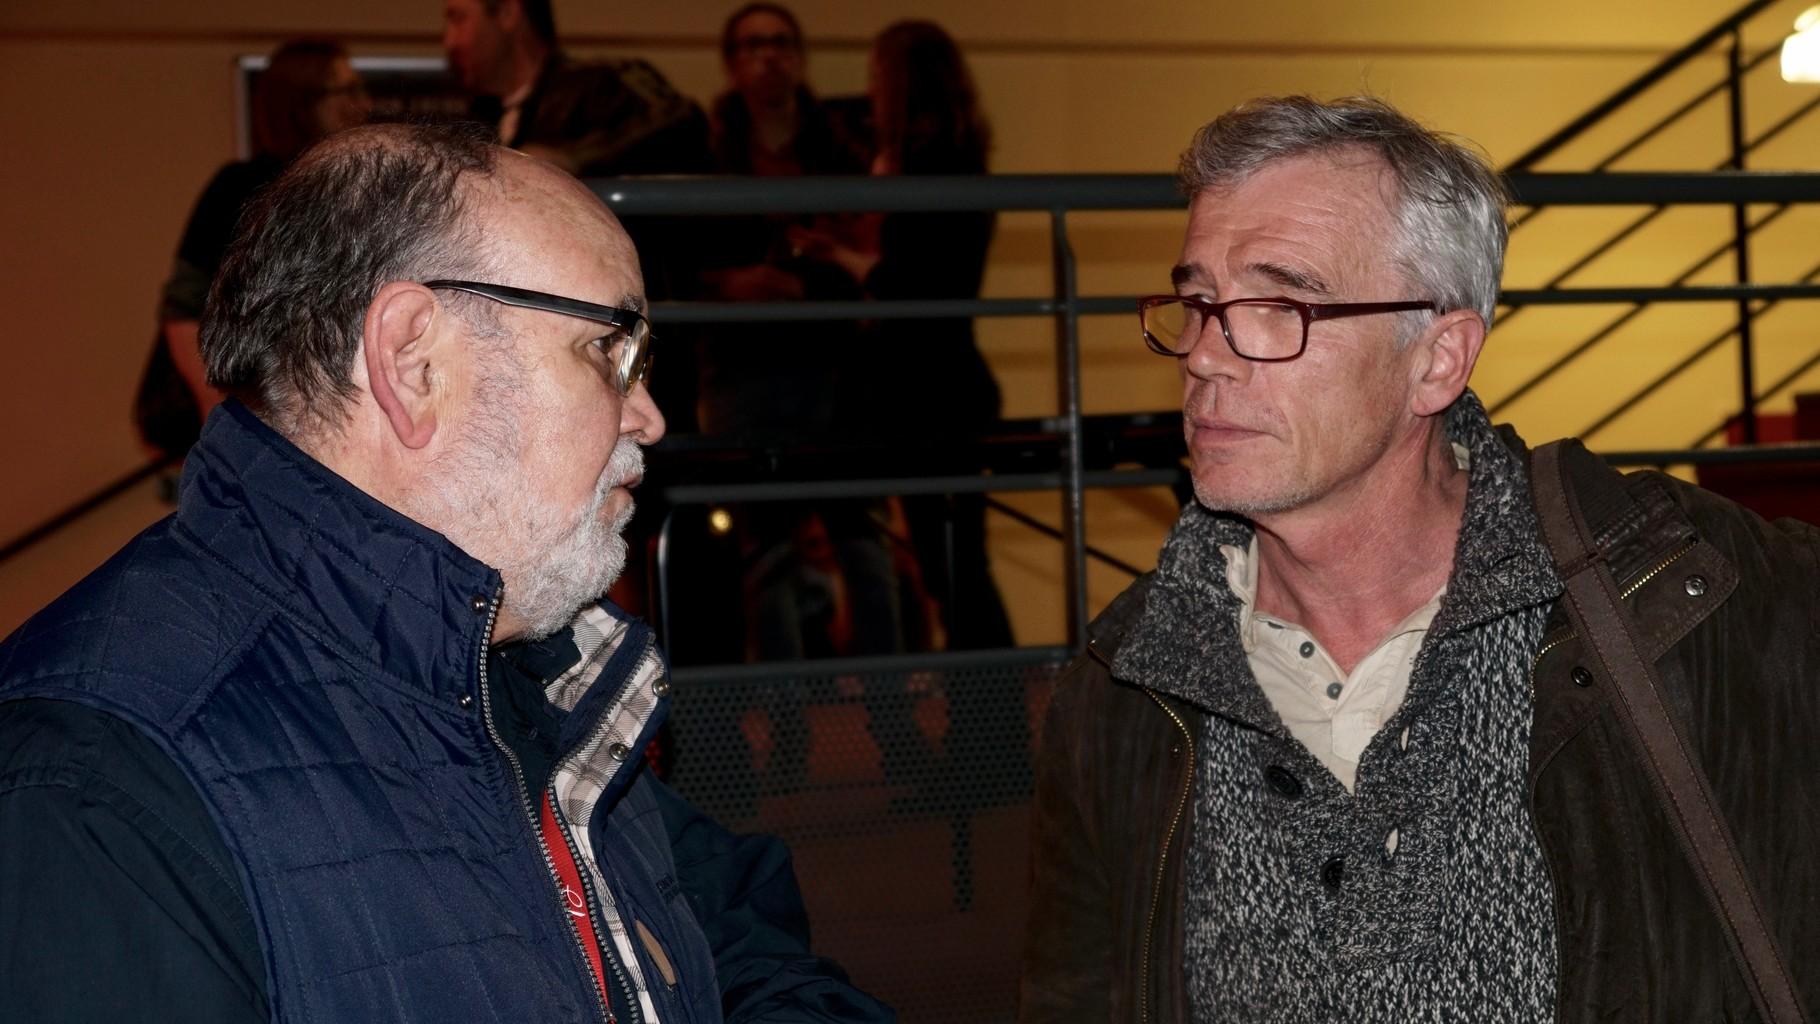 SOIREE DU GRAND ECRAN  Luis CLOS et Luc BERNARD